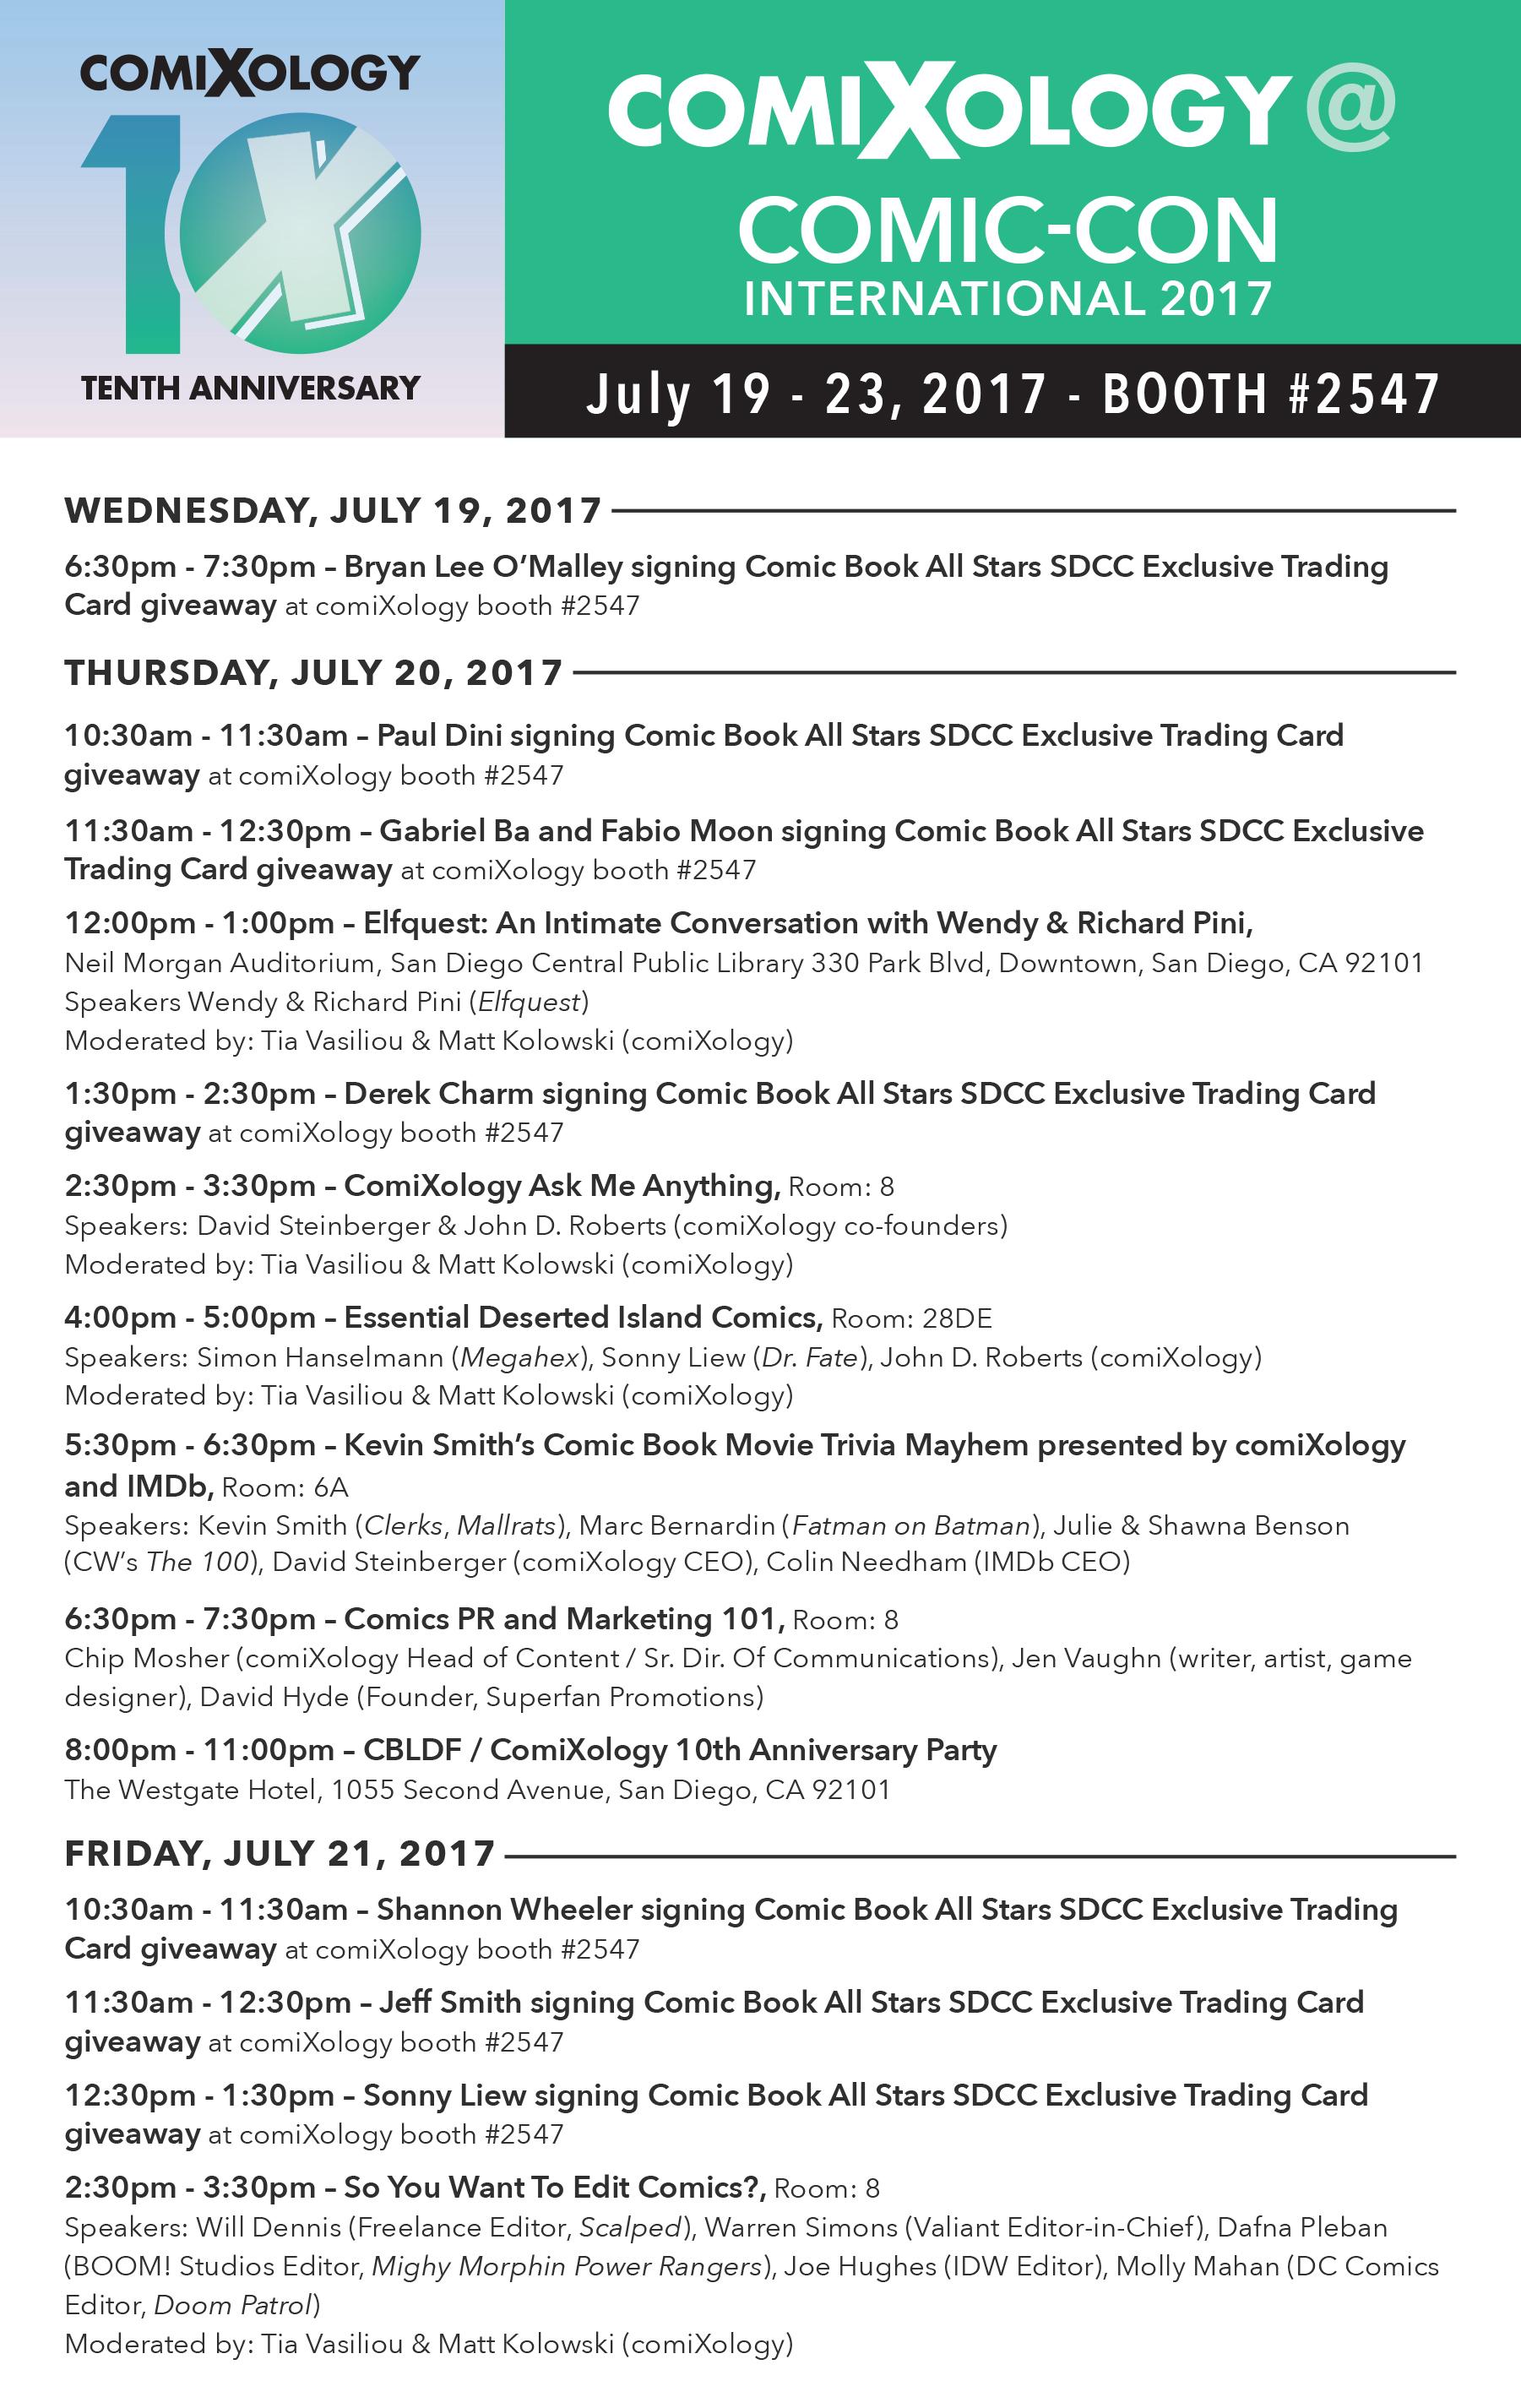 2017_comiXology_SDCC_schedule_Wed-Fri_Updated.jpg